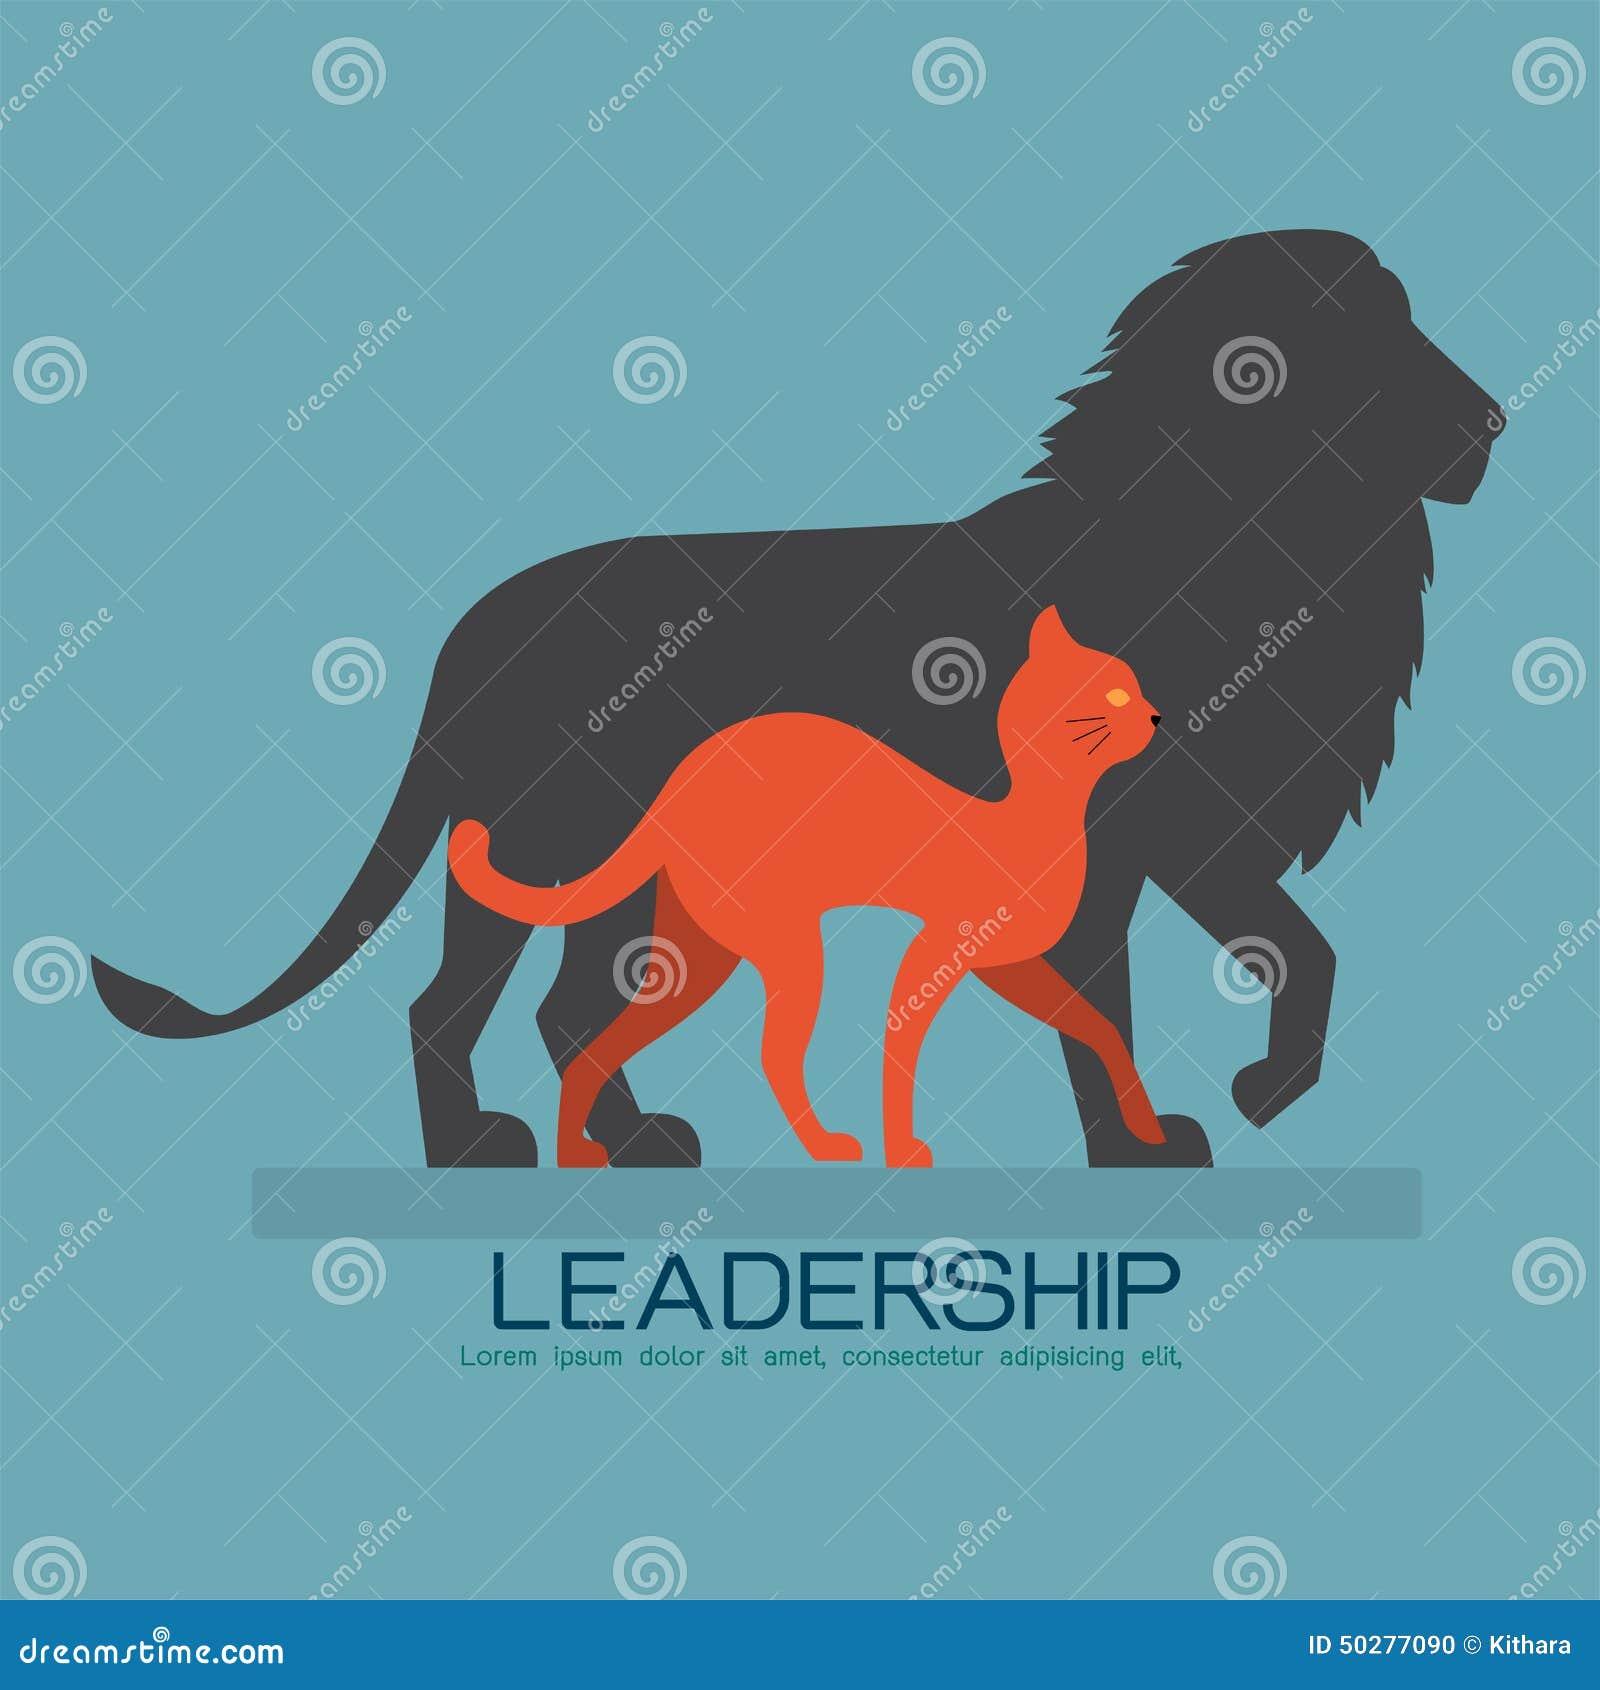 leadership and power in the lion Leadership in the lion king team crisscross: gabriella balli, anisha borthakur, walker dyess, haley lockwood, bailey mintz ethical leadership power dynamics good leadership unethical leadership transactional leadership bad leaders abusive power.